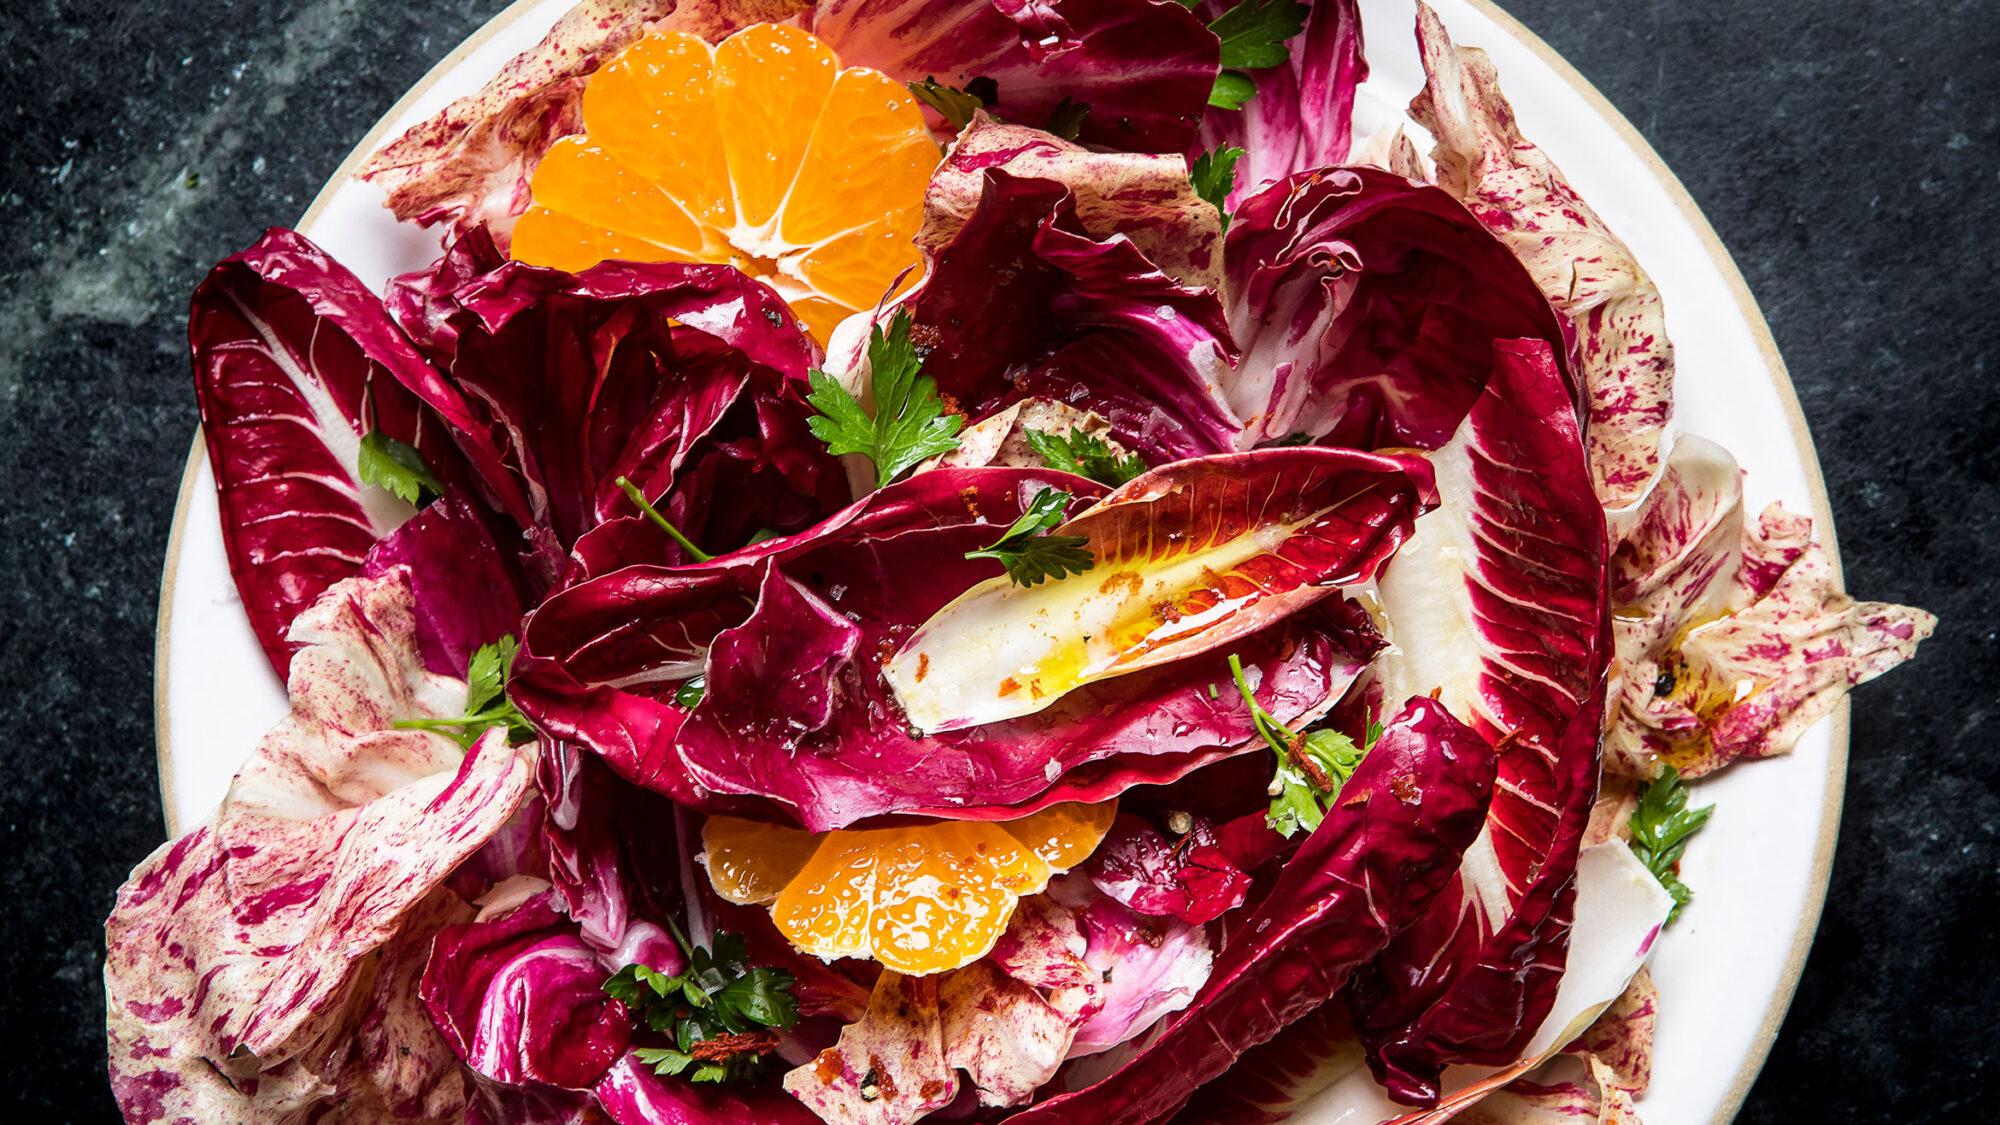 Article-Radicchio-Salad-Treviso-Bitter-Greens-Recipe